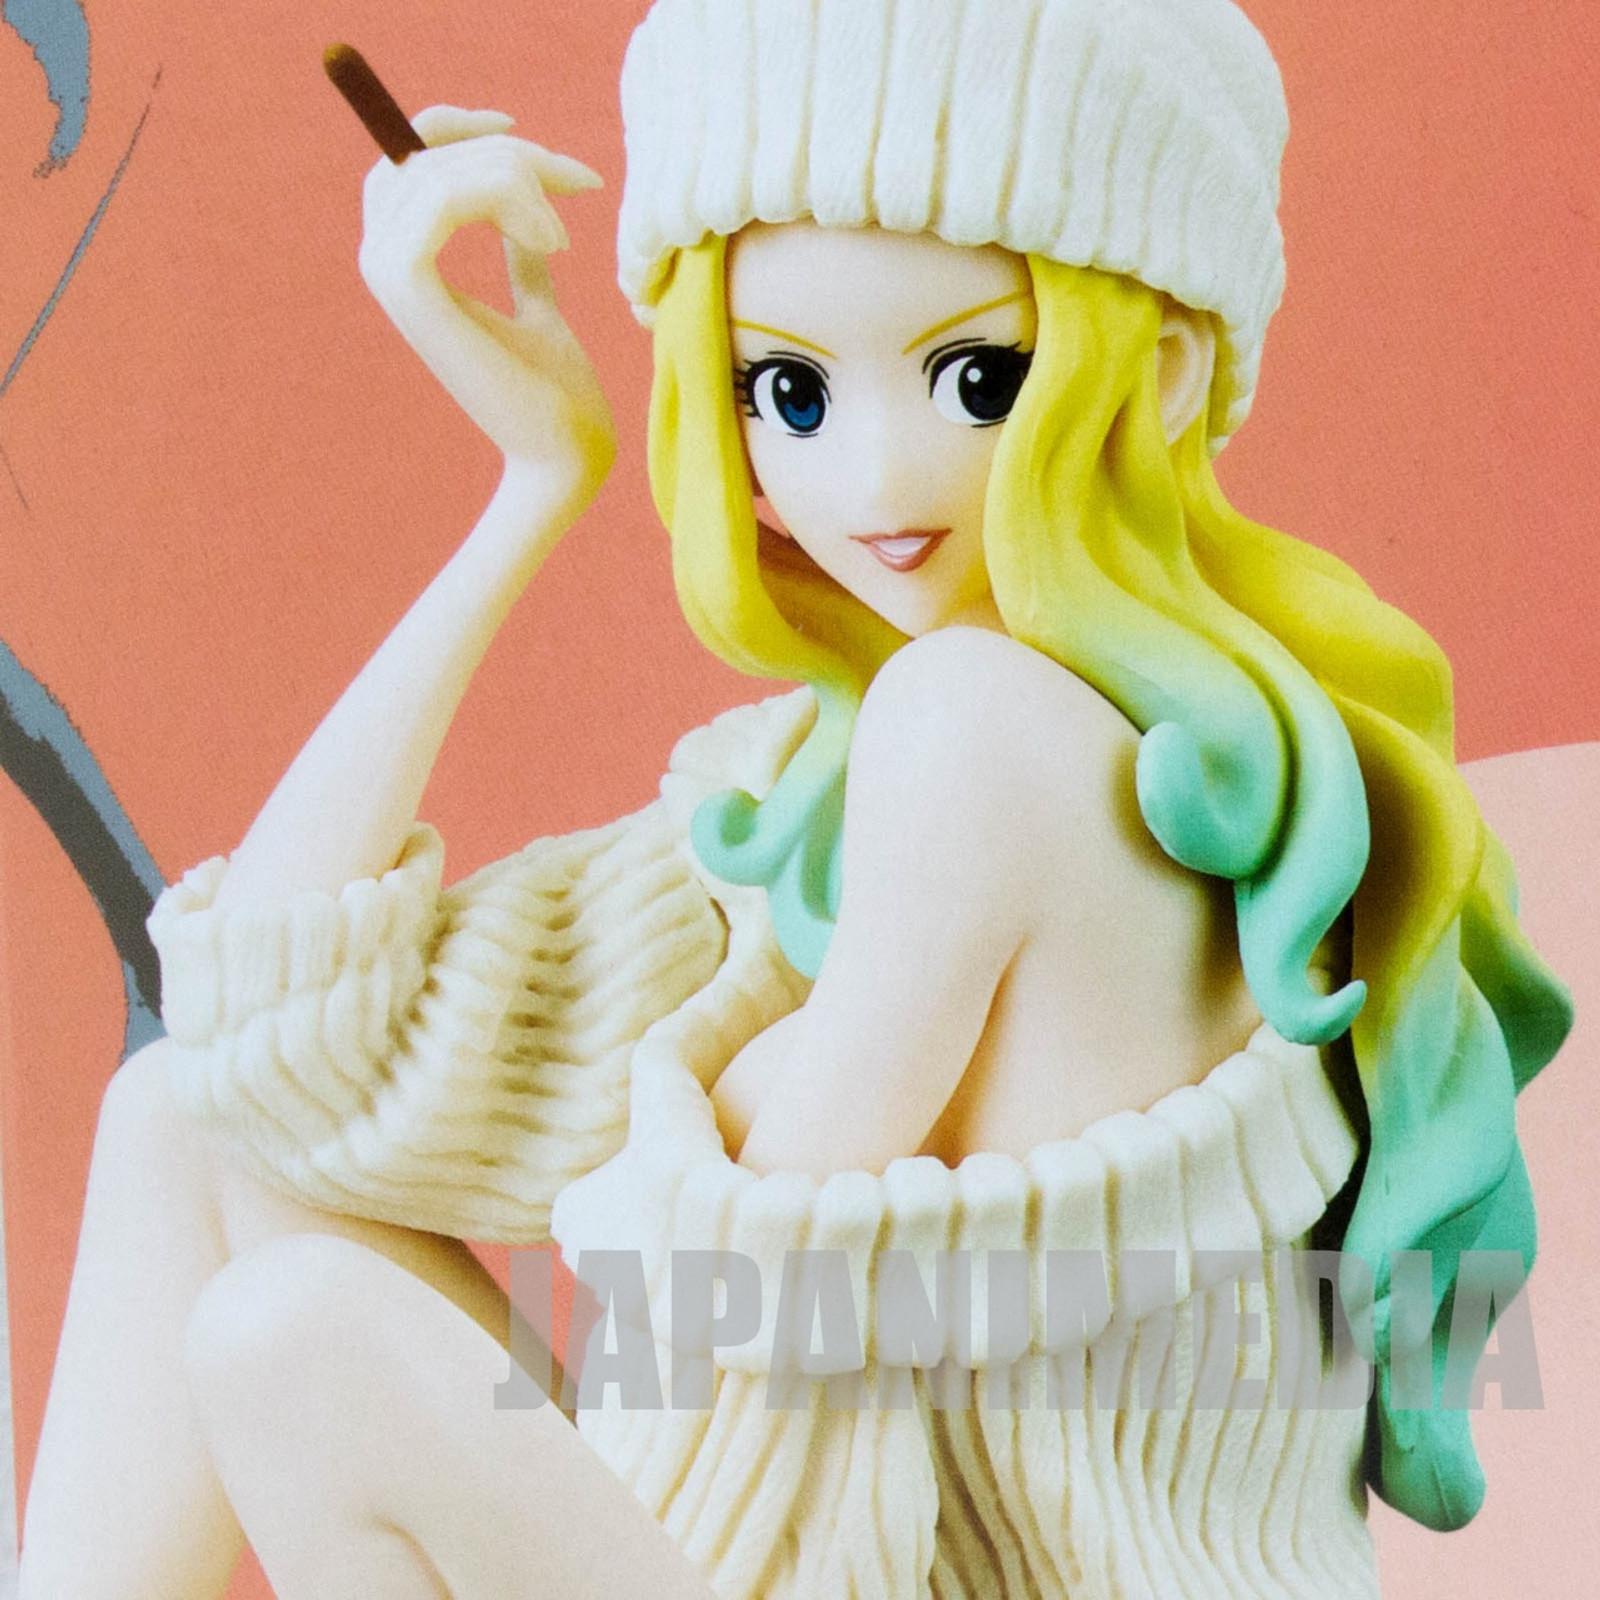 Lupin the 3rd Rebecca Rossellini Groovy Baby Shot Figure White Banpresto JAPAN